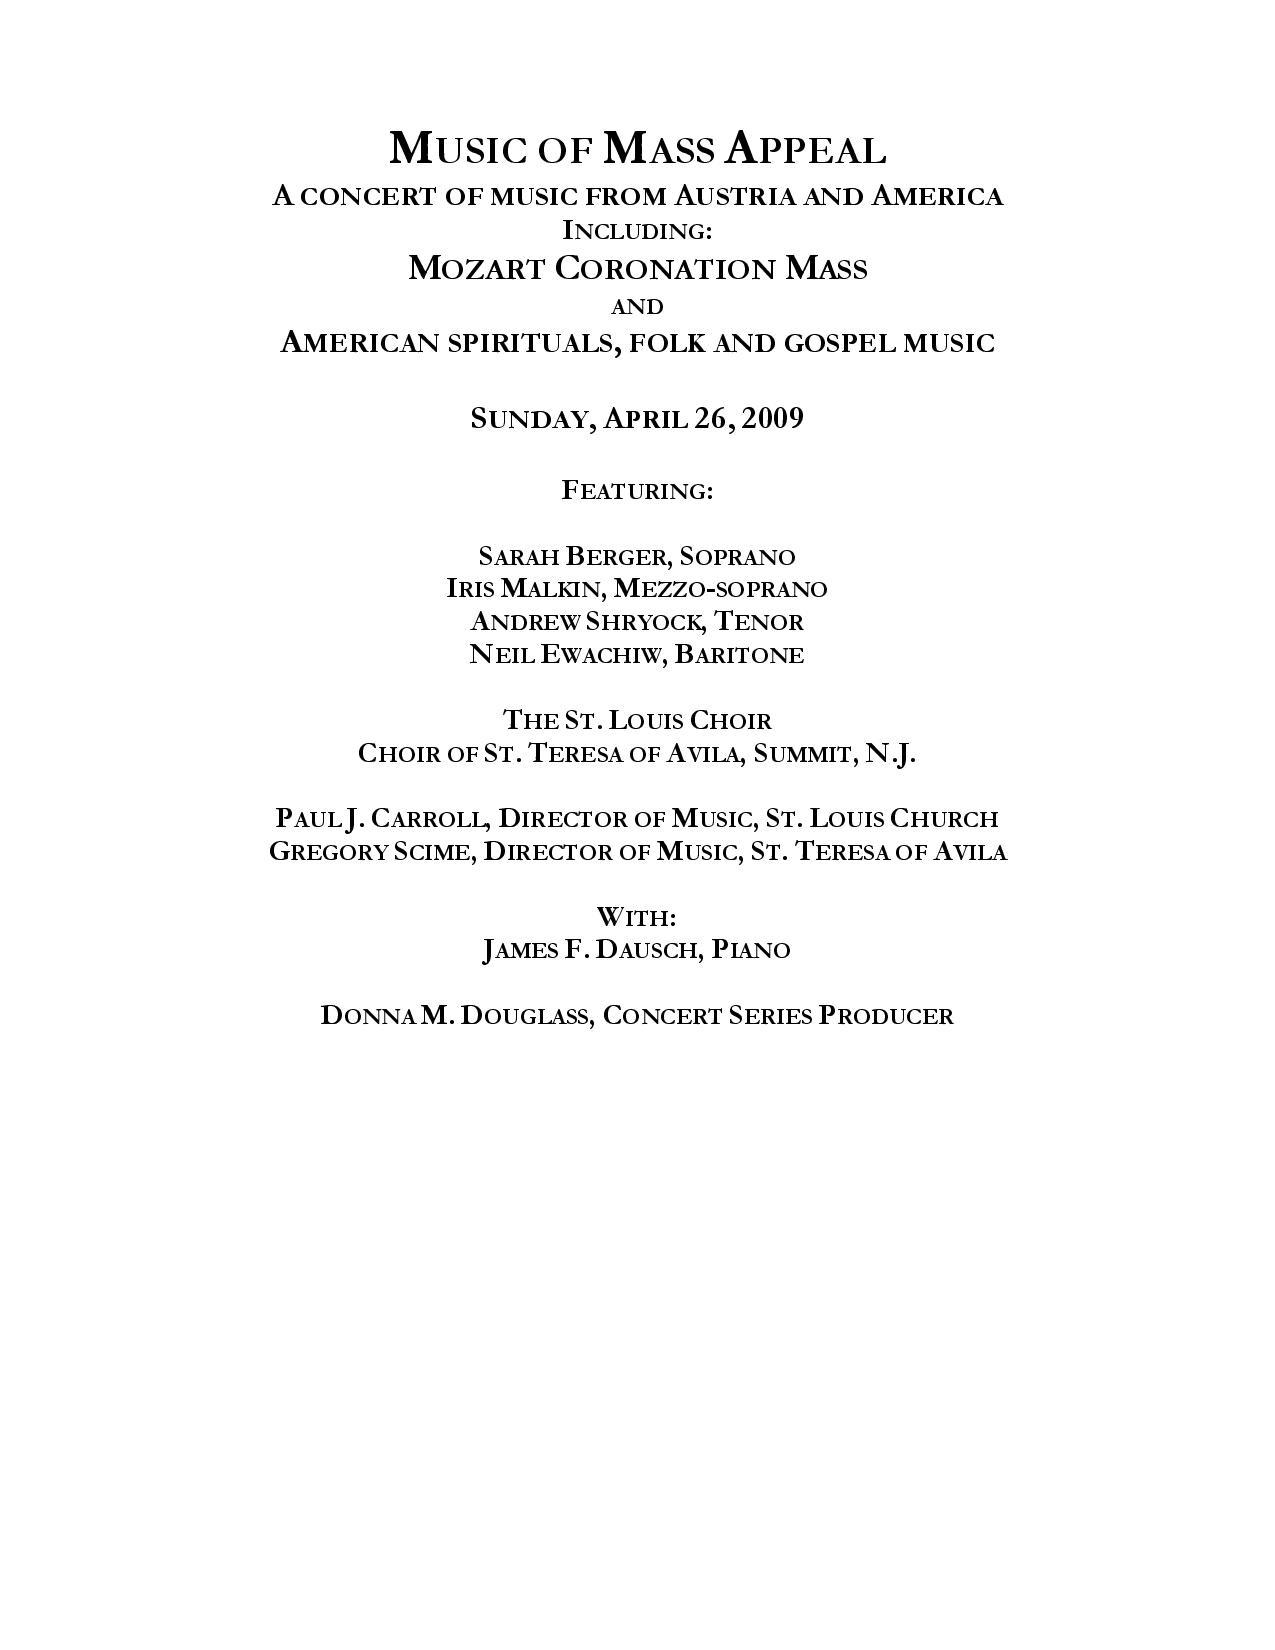 2009-04-26 - Program for Printing-page-002.jpg